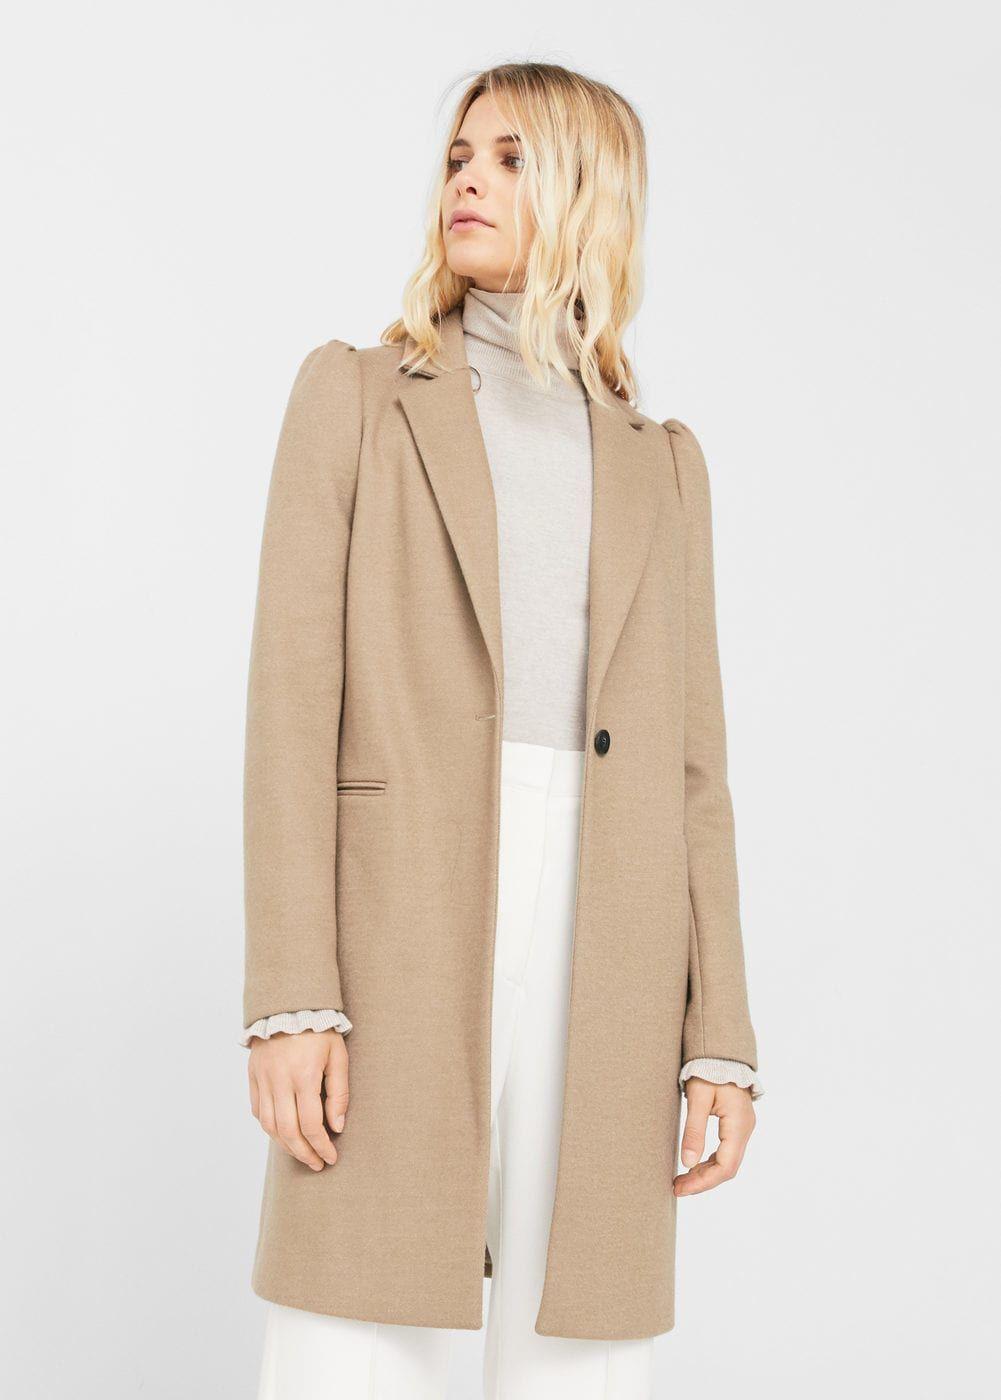 caae9c280777 Manteau manches bouffantes   MANGO   Fashion - jackets   Pinterest